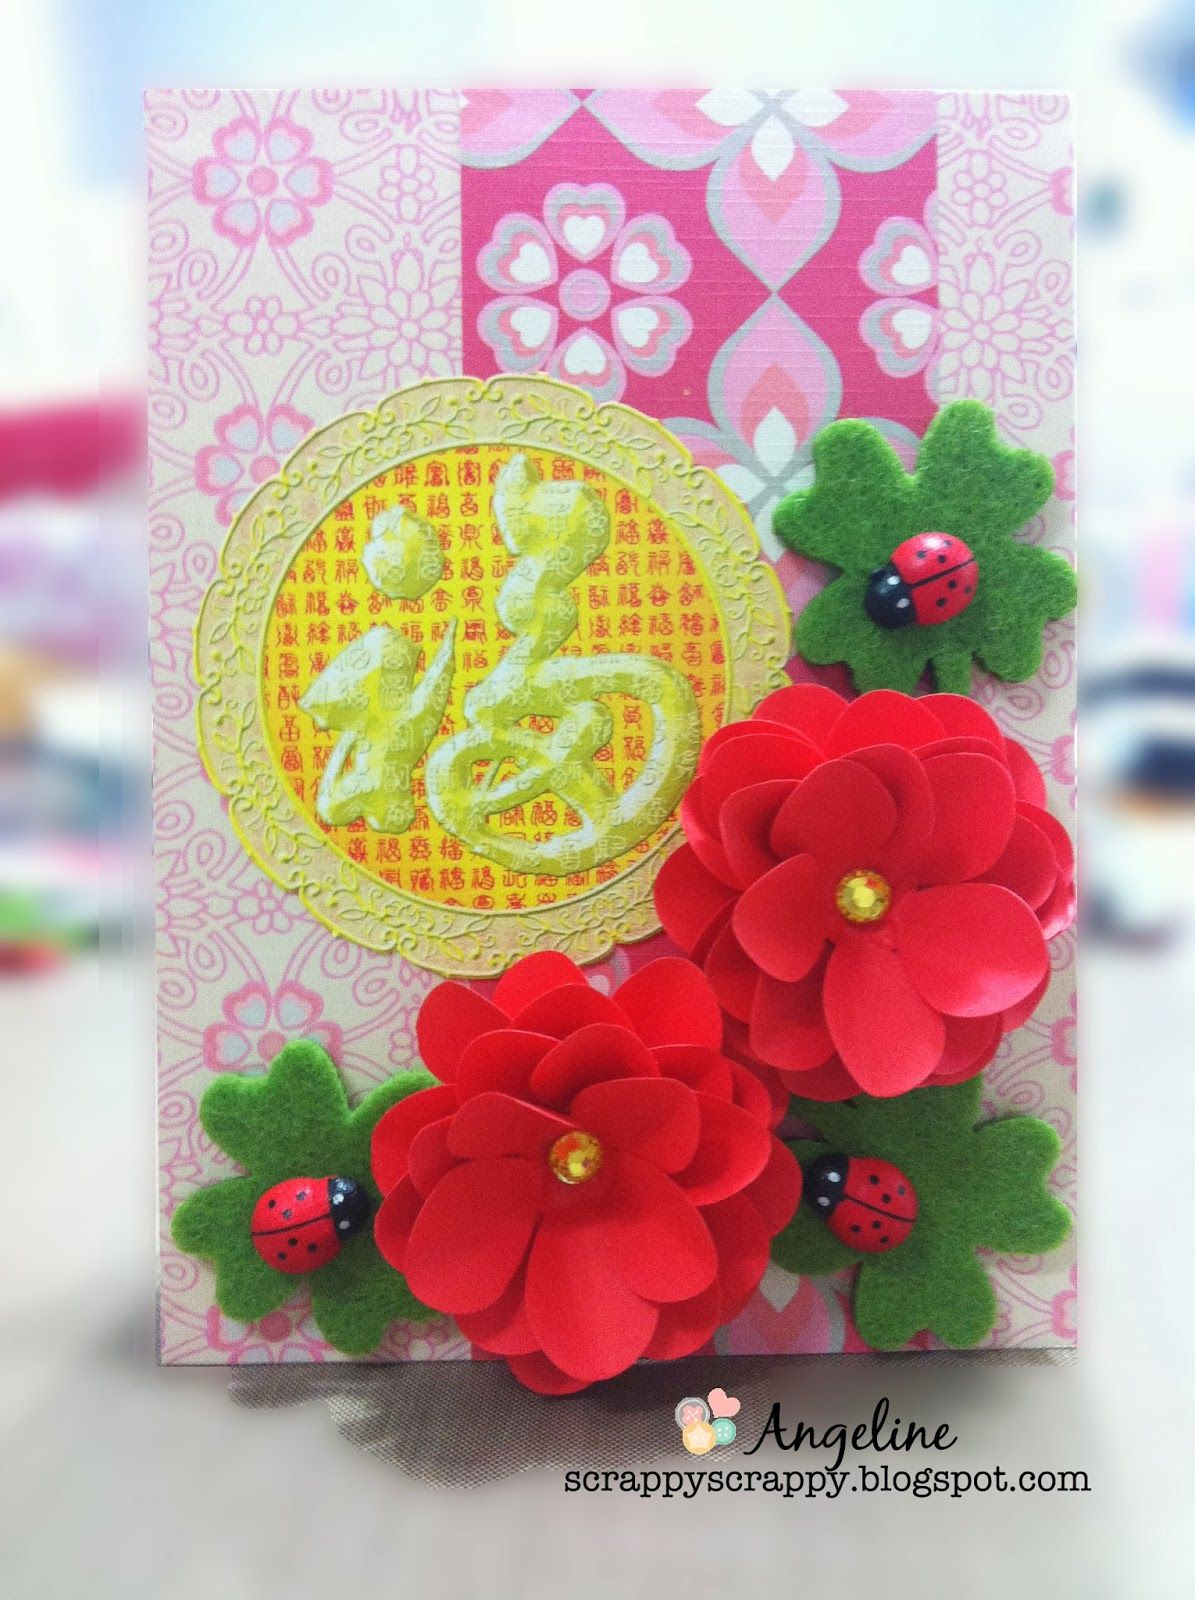 Scrappyscrappy Happy Chinese New Year Card Diy Flowers Crafty